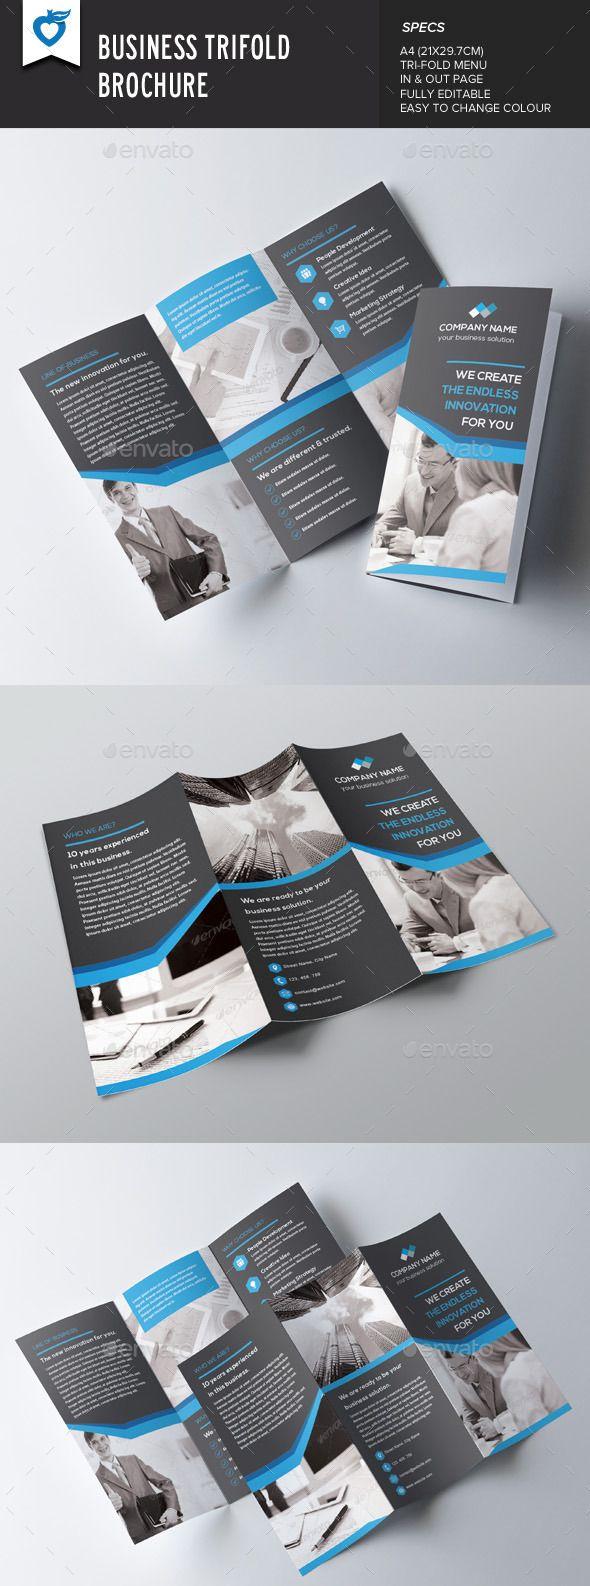 editable brochure templates free